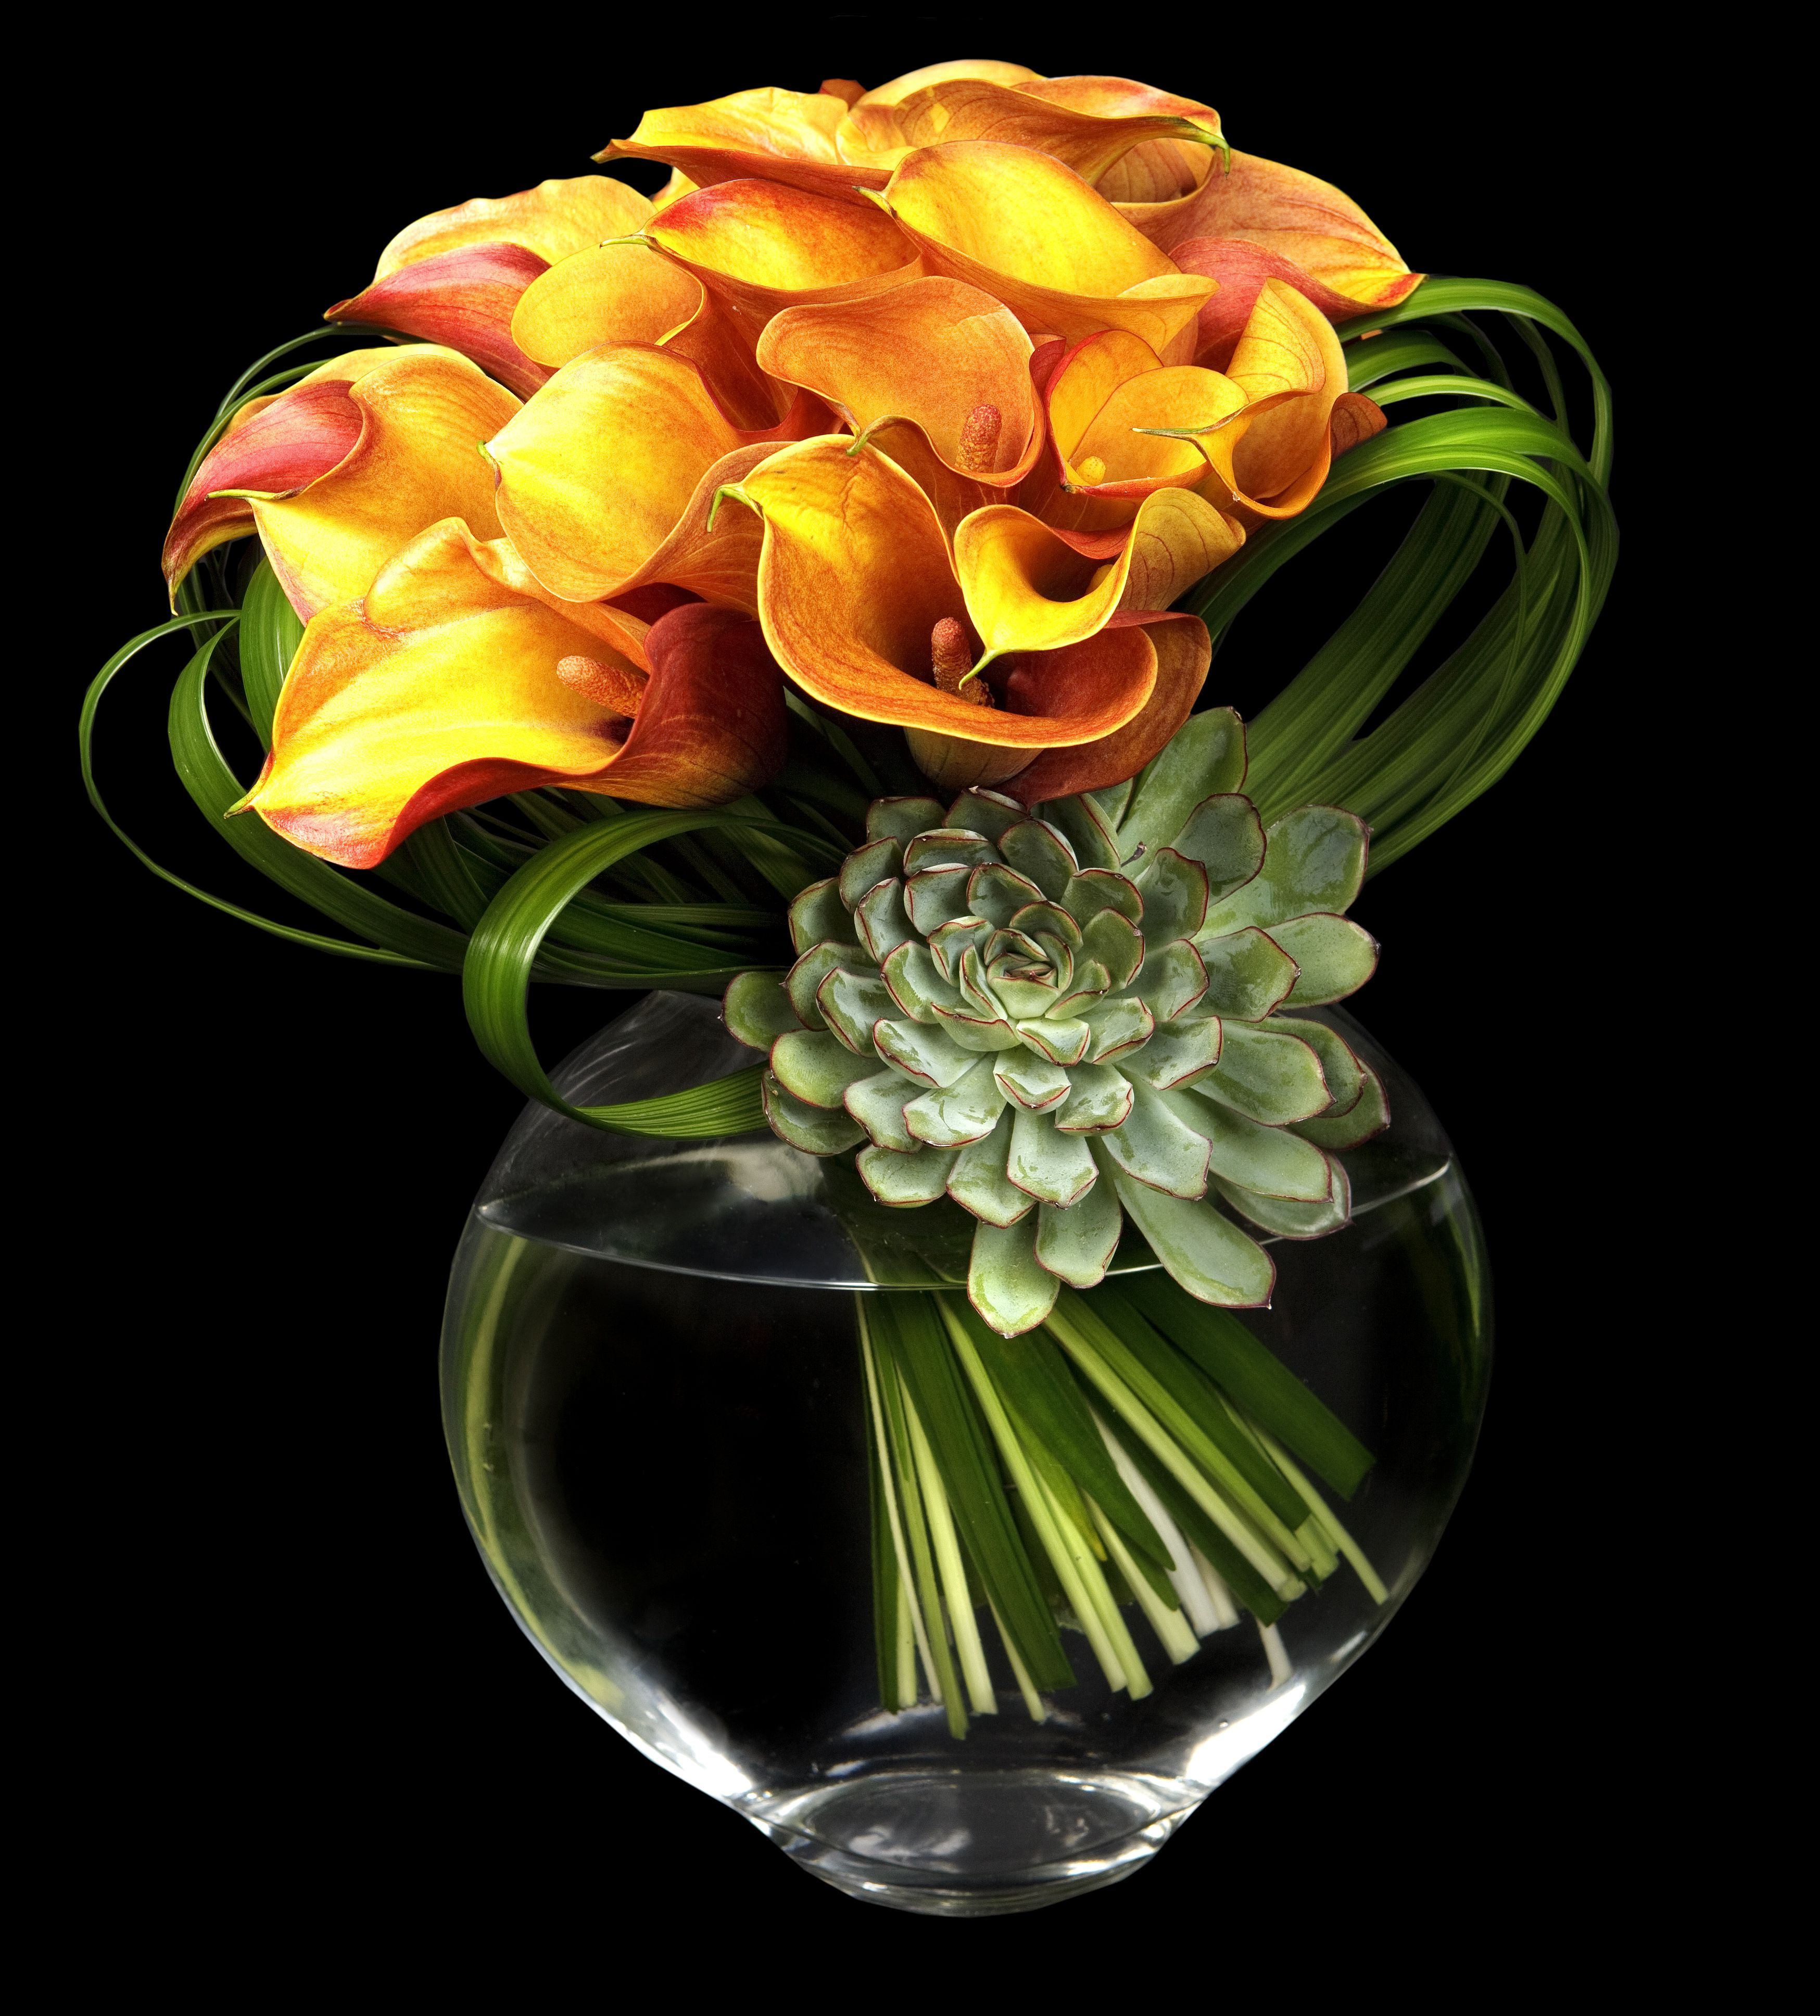 Florea tu hogar con estas pequeñas joyas contemporáneas